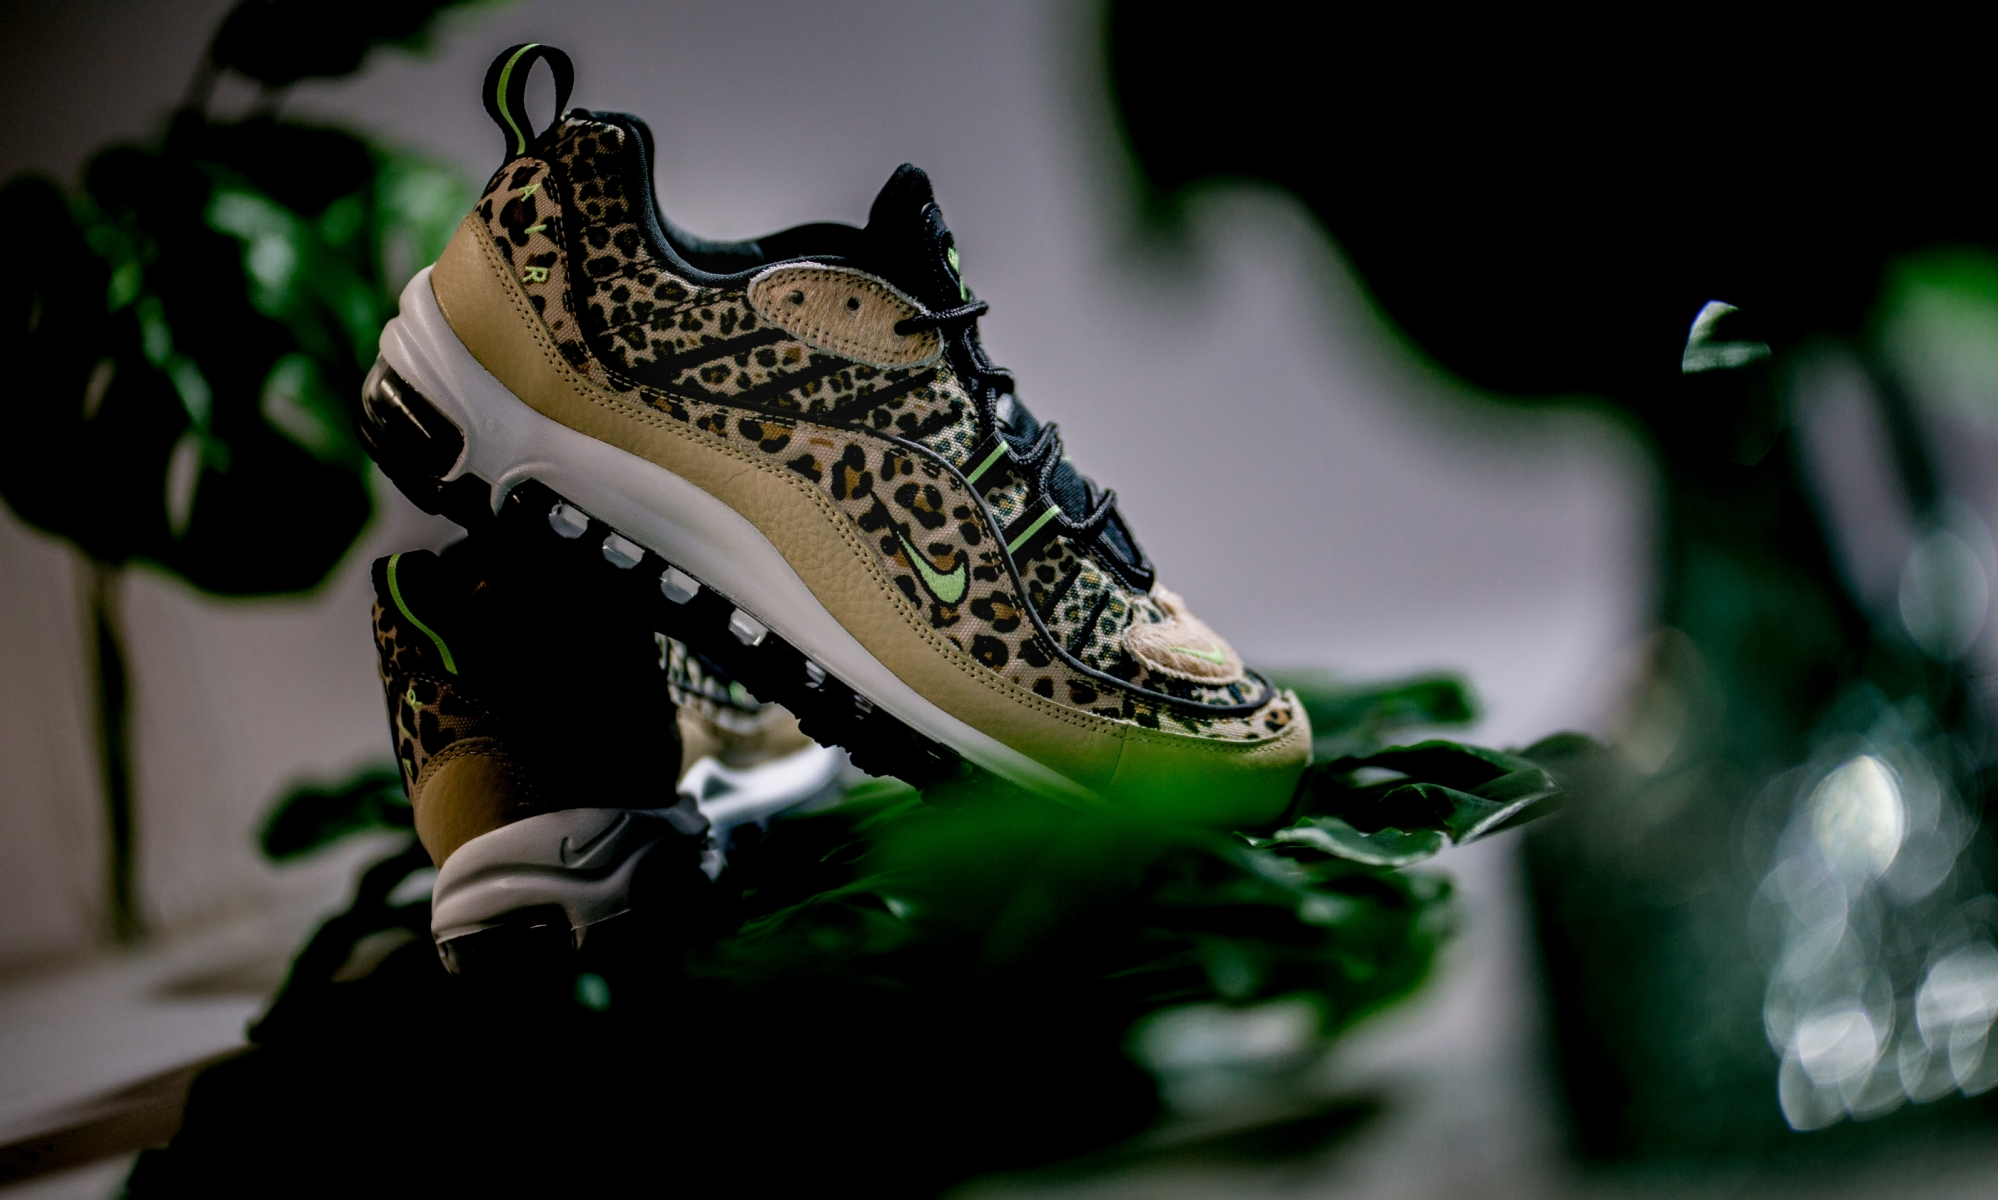 Nike Leather Air Max 98 Leopard Print